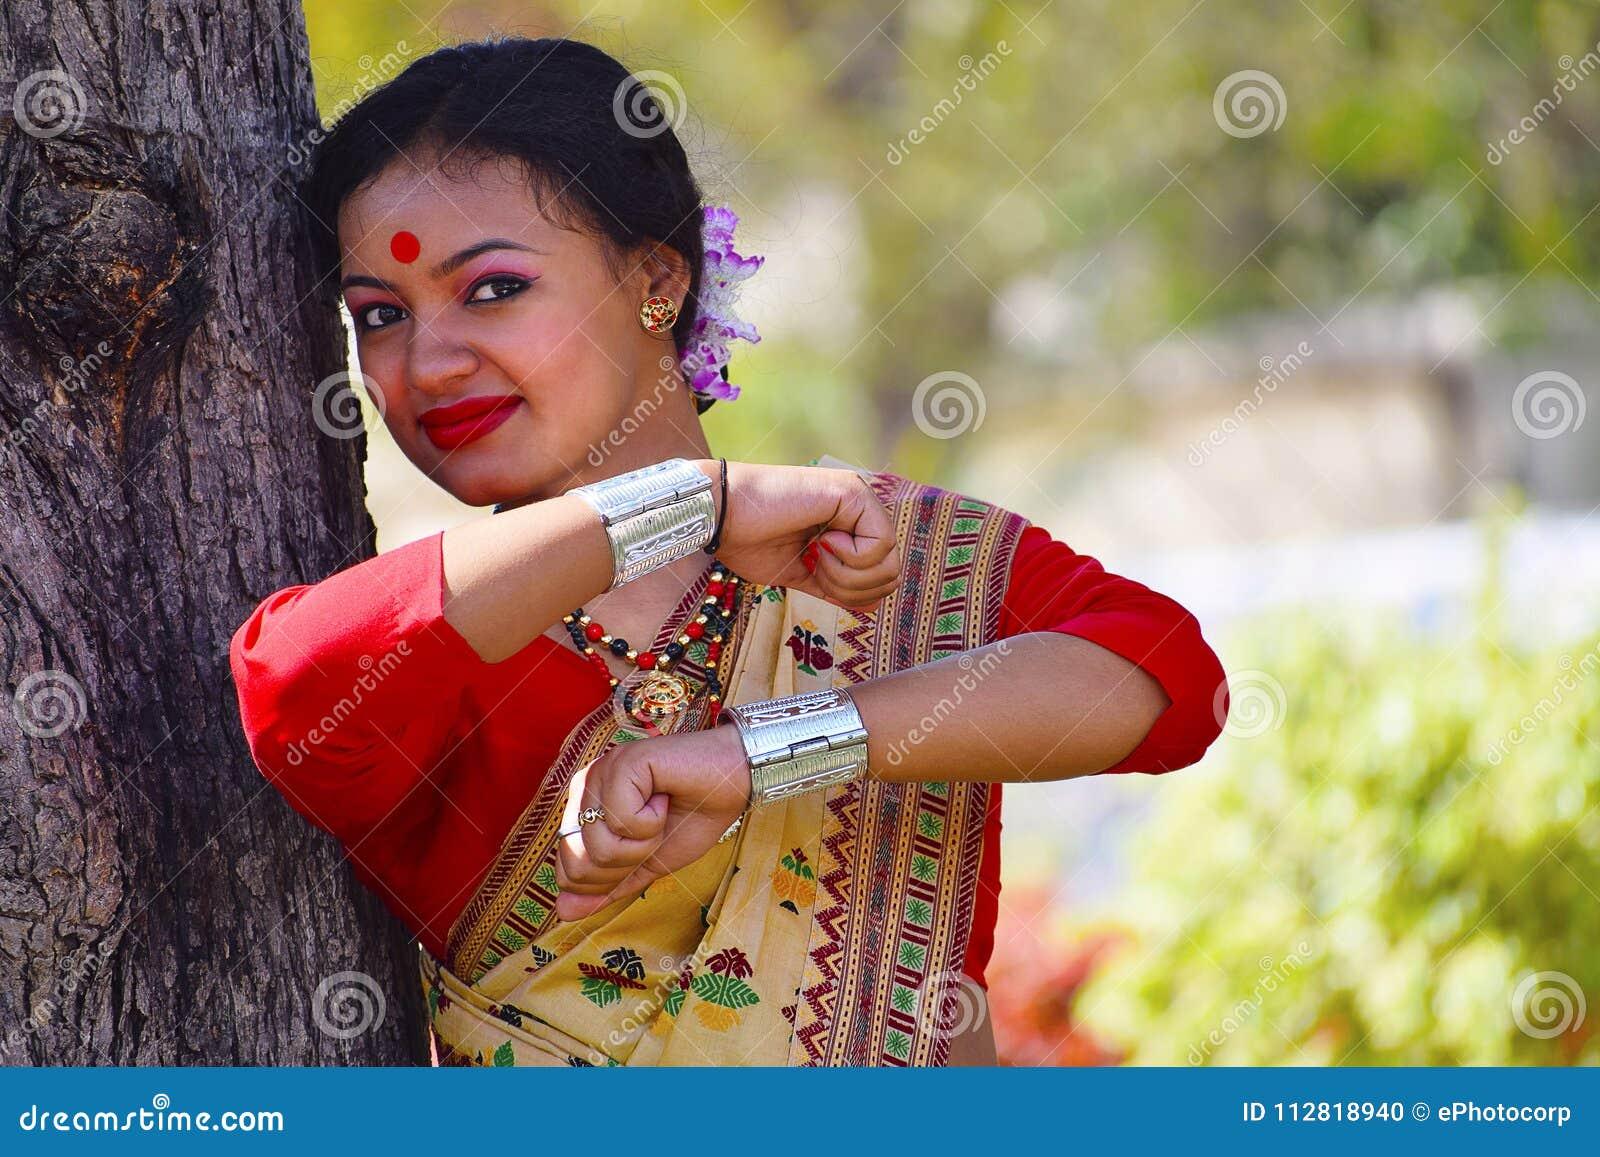 Assamese girl In traditional attire posing. Bihu Dance, Pune, Maharashtra